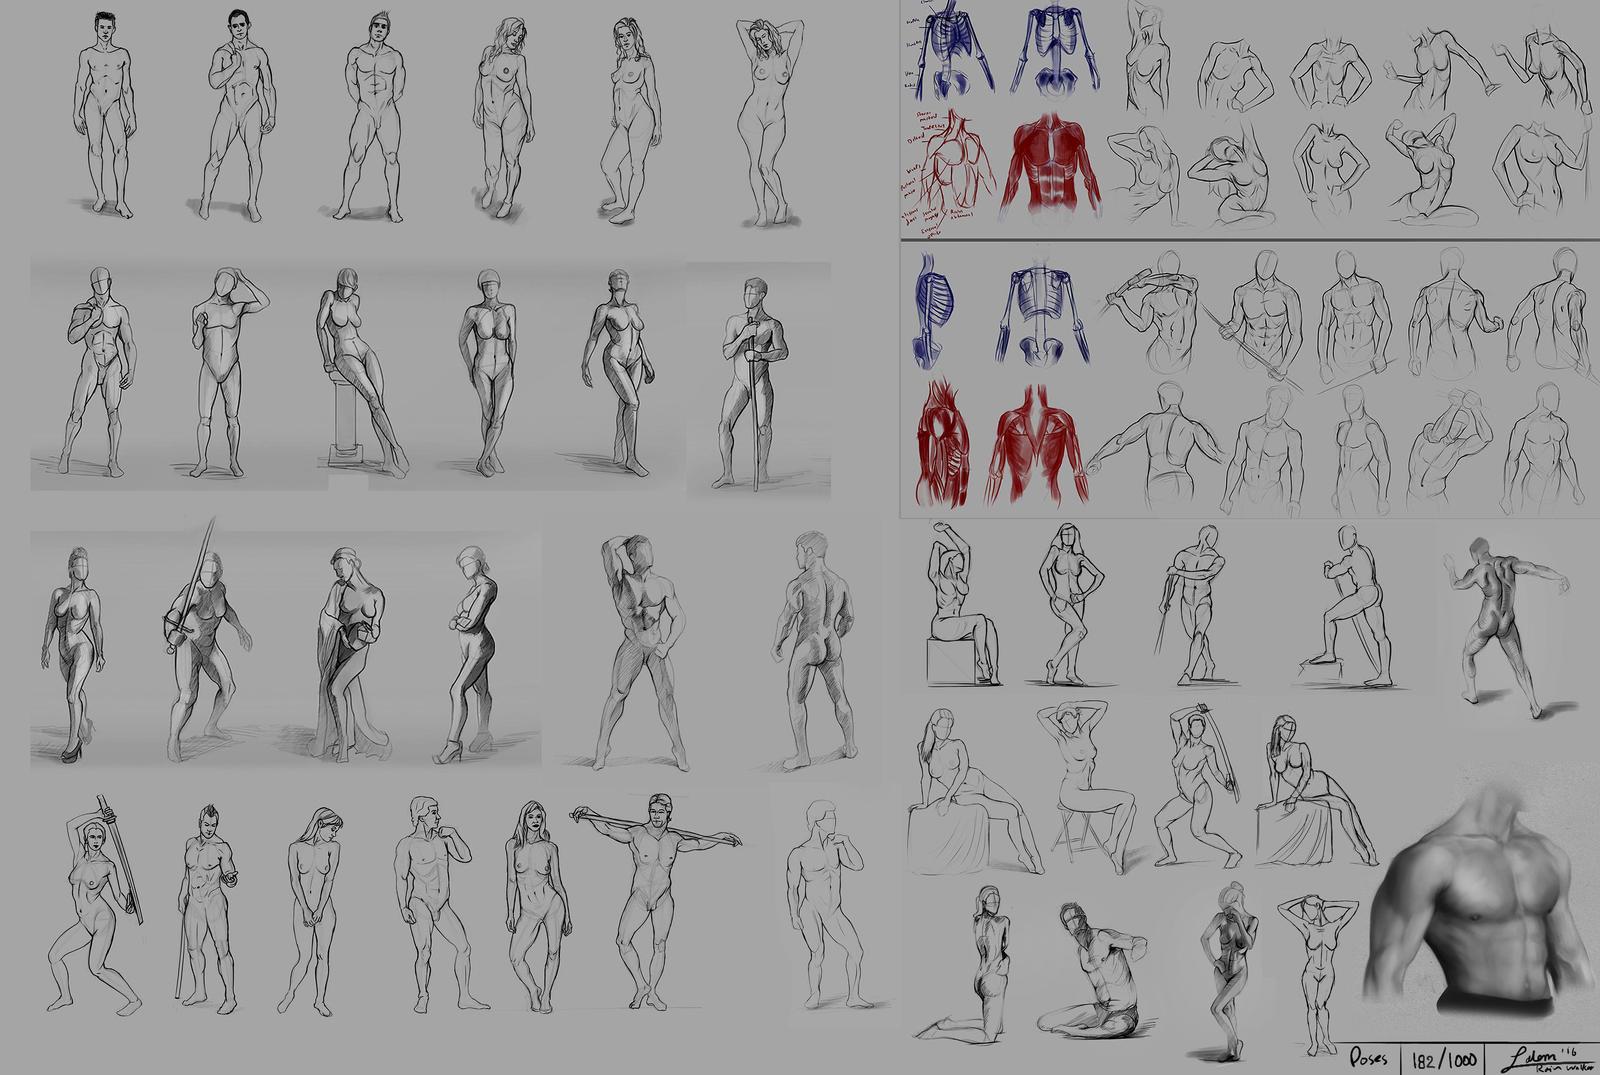 figure drawing Practice 182 / 1000 by rainwalker007 on DeviantArt